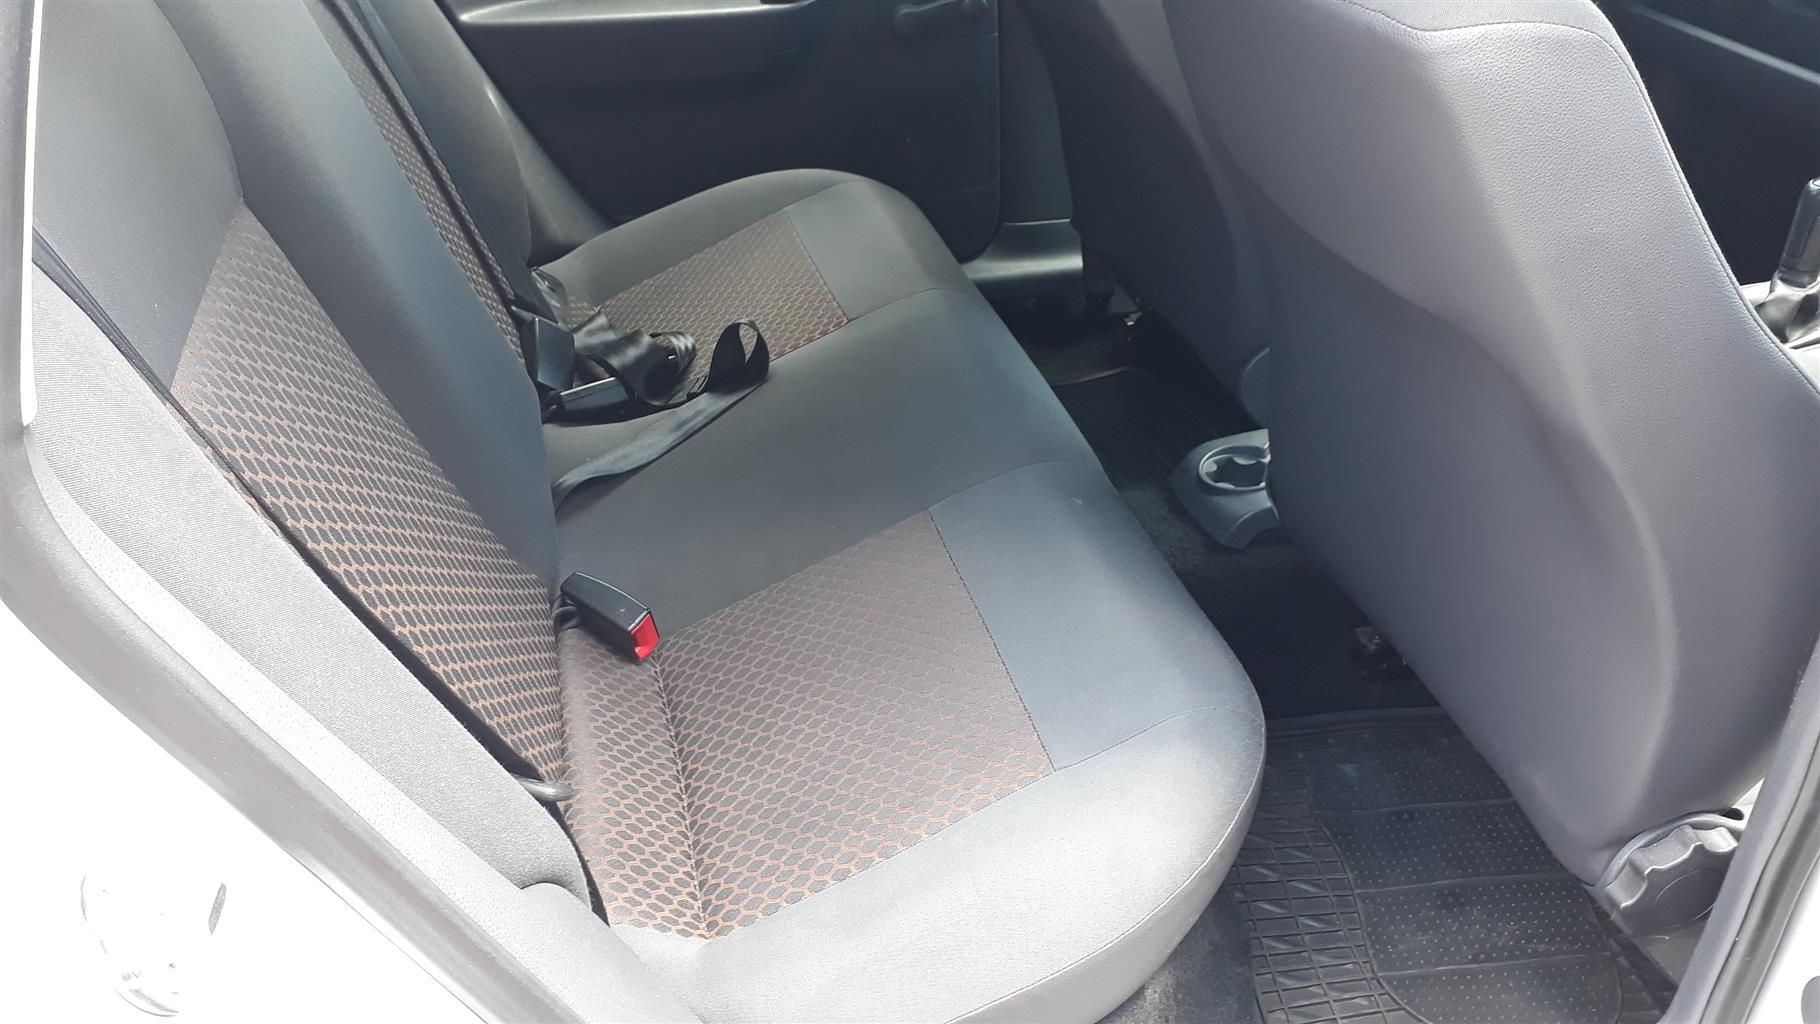 2013 VW Polo Vivo 5 door 1.4 Trendline